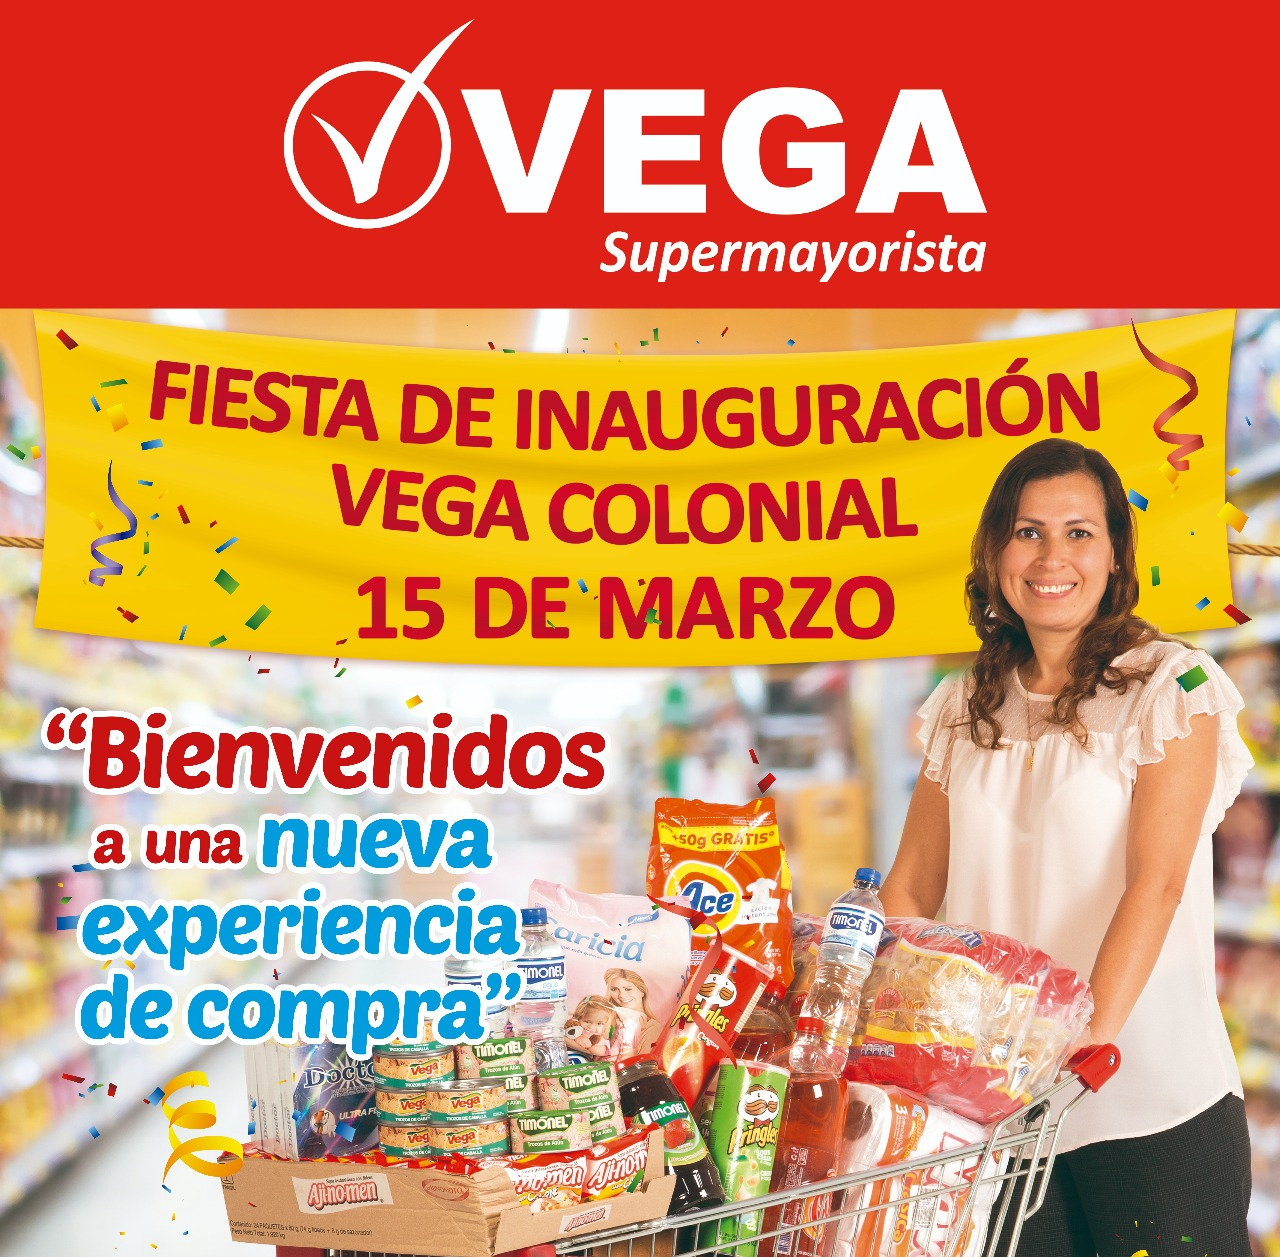 IMG 20180315 WA0013 - Vega inaugura local en Via Mix Colonial